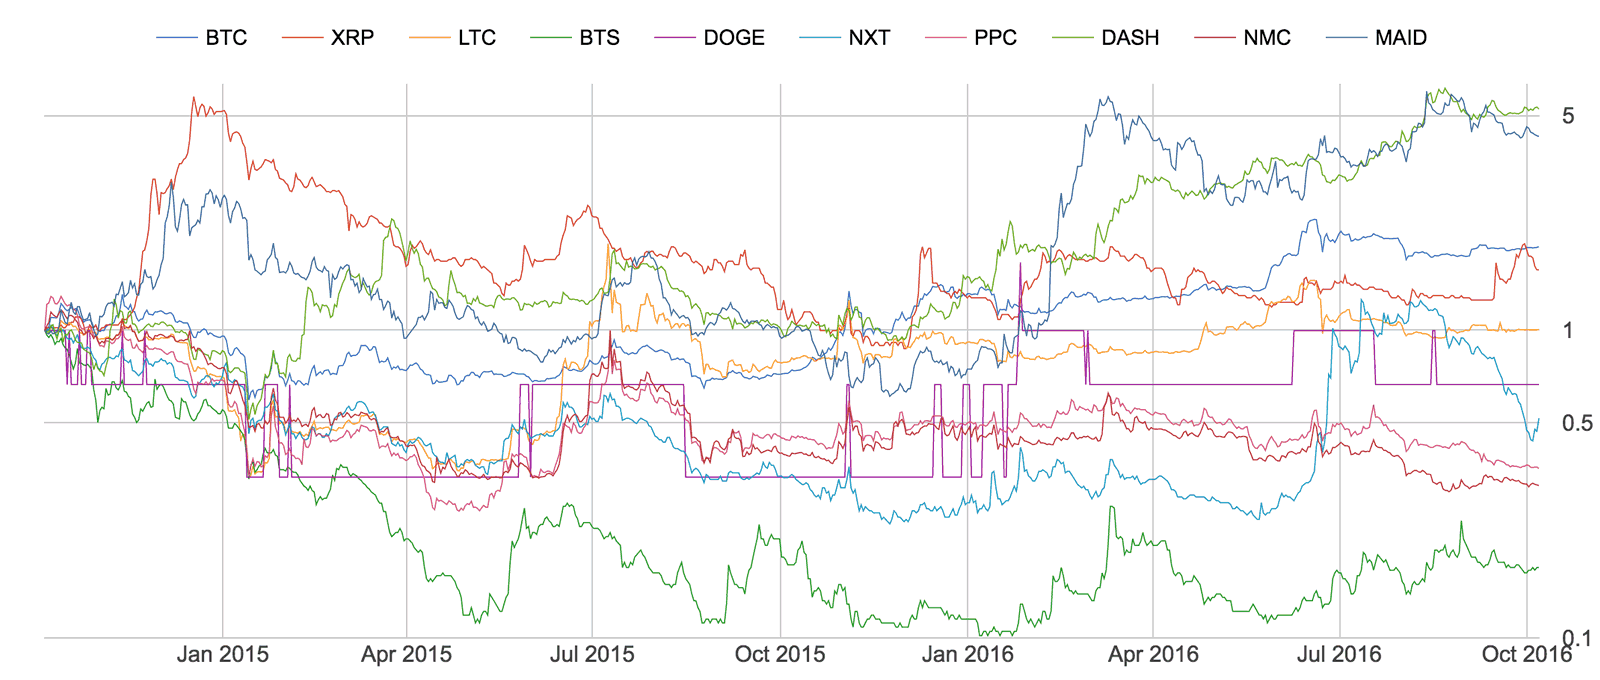 Top 10 coins, returns starting 24 months ago